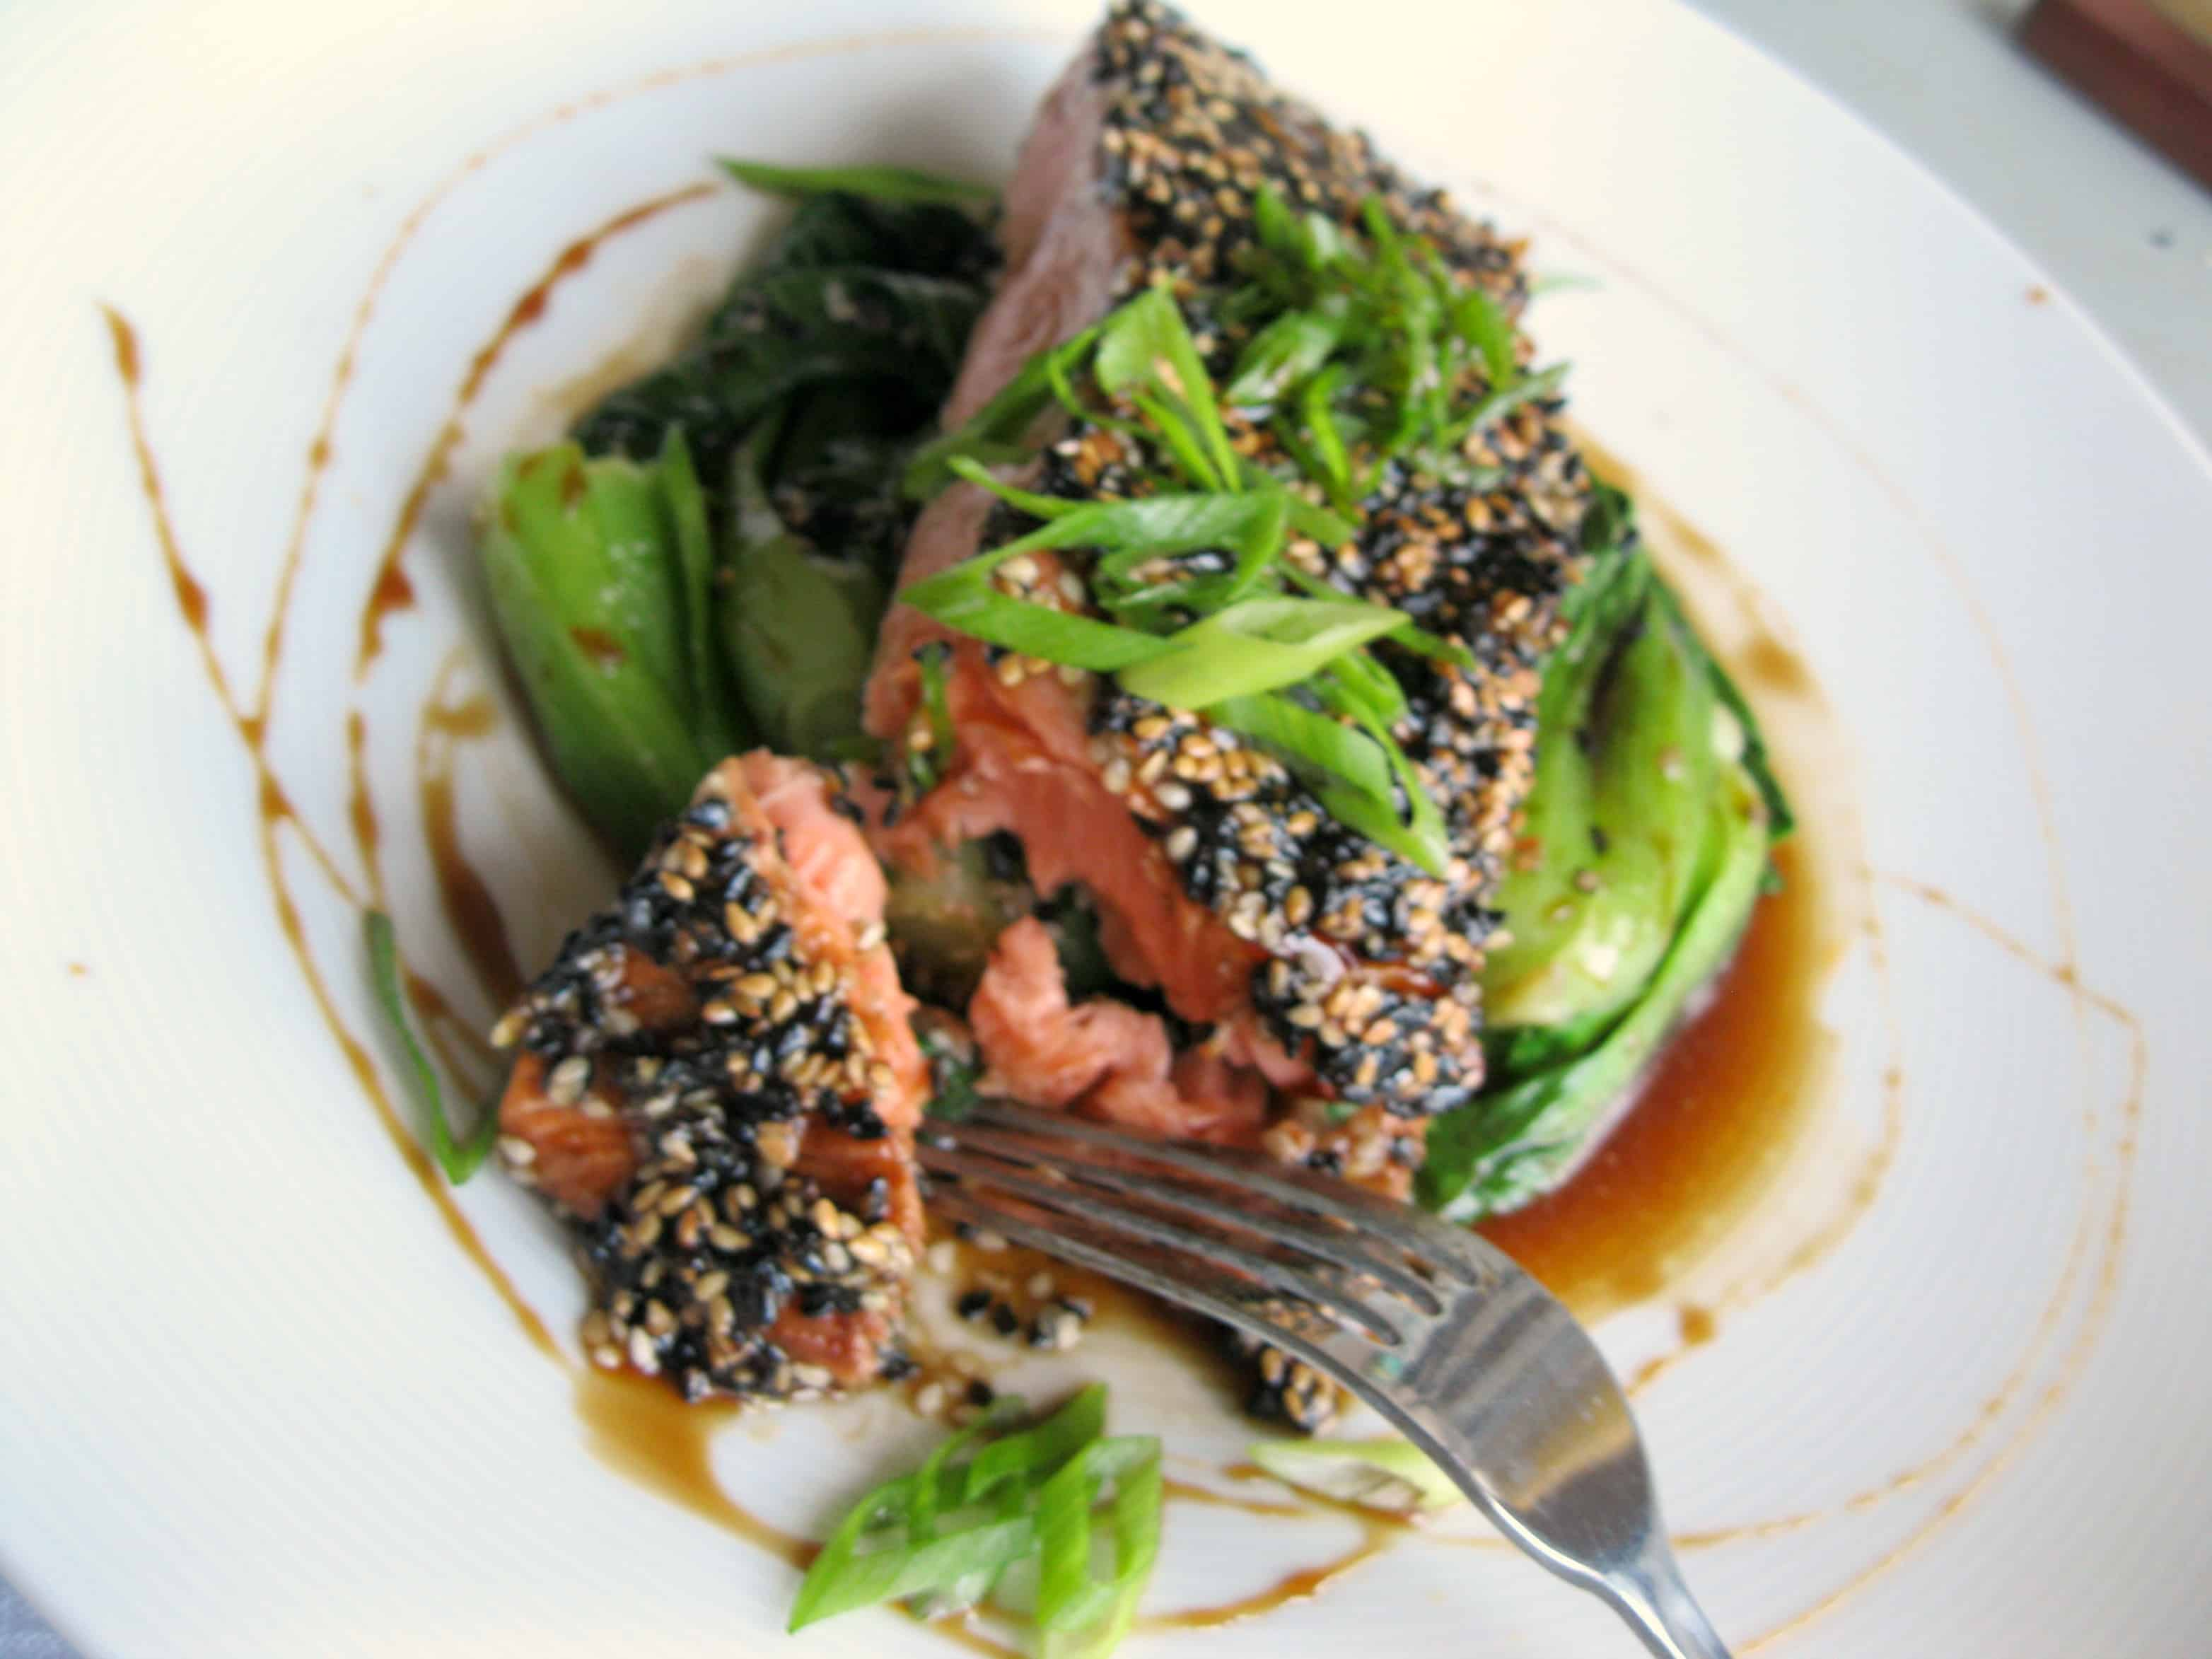 A fork cutting a bit of sesame crusted salmon.